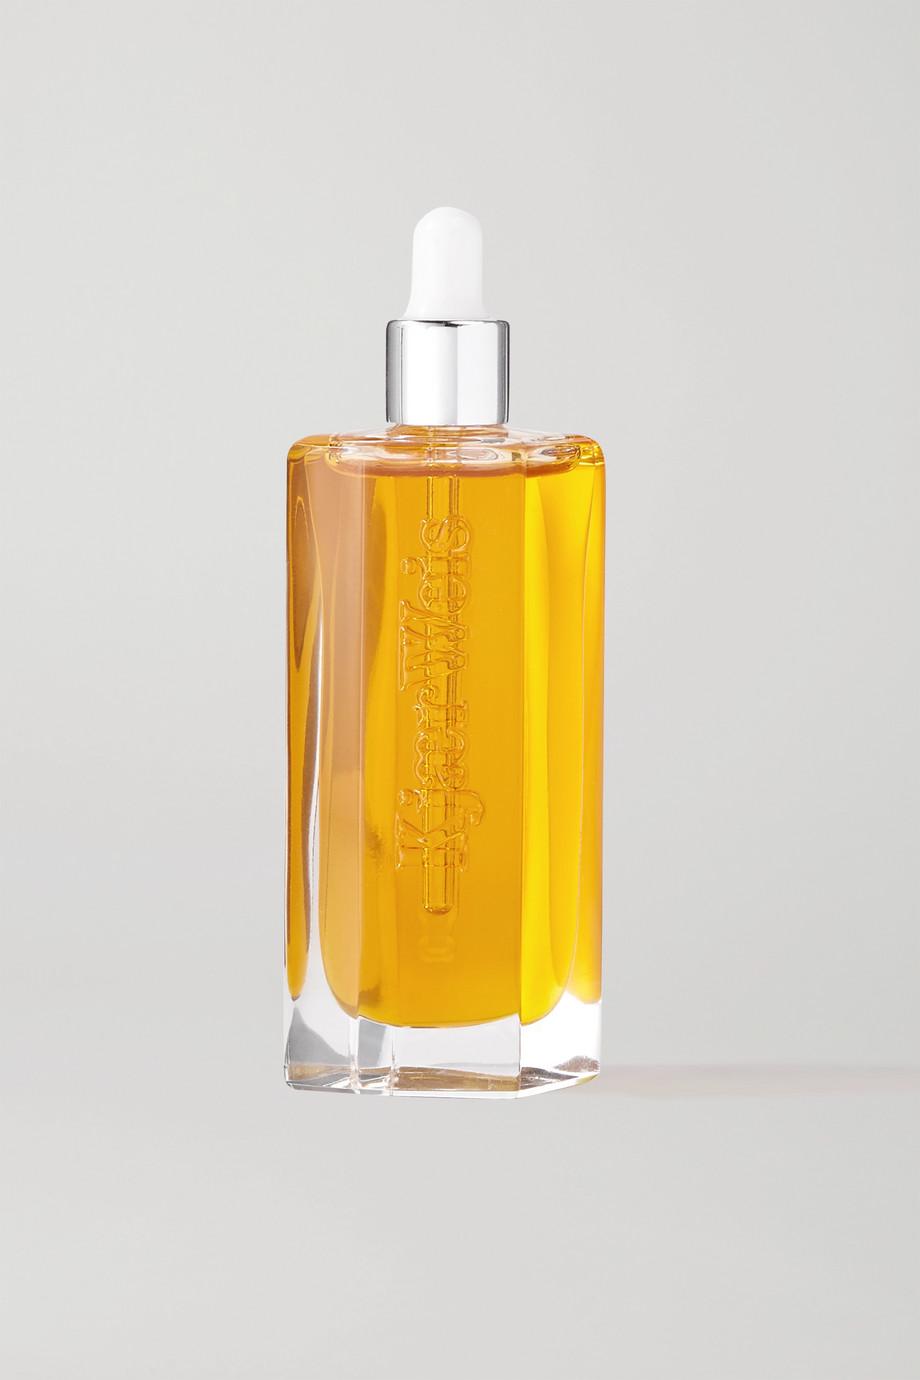 Kjaer Weis The Beautiful Oil, 30ml